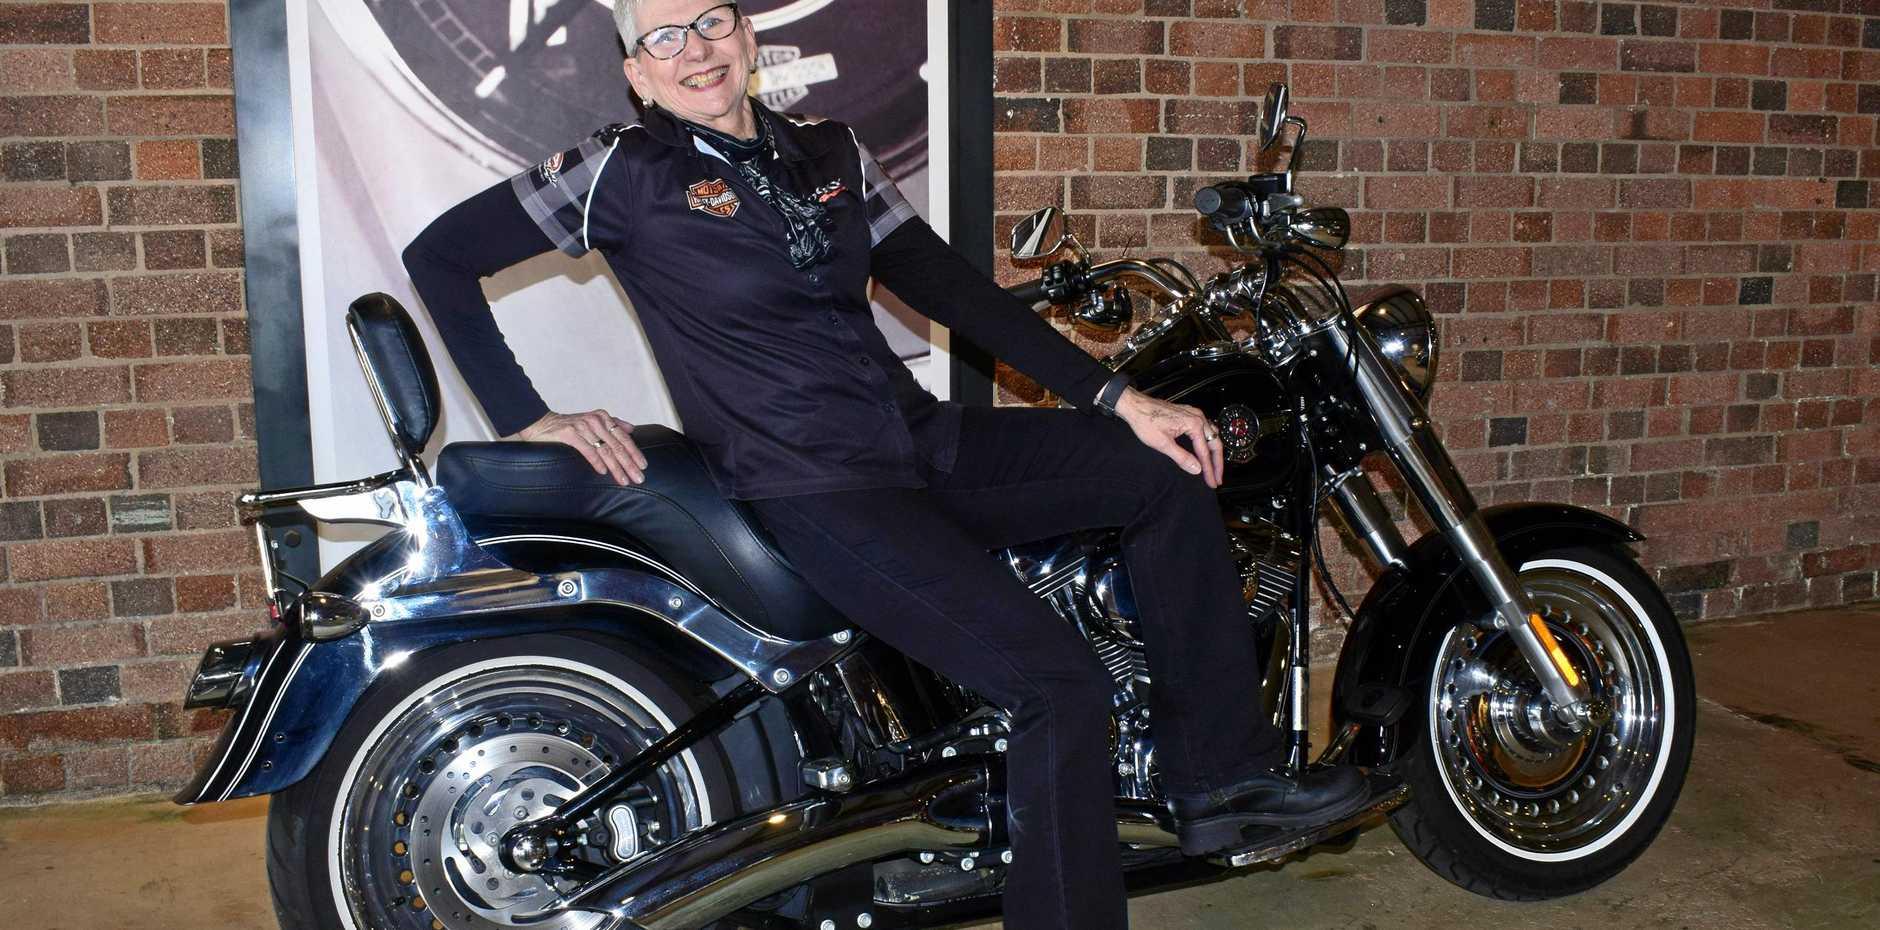 Carolyn Guley at Harley Davidson Rockhampton has organised the Purple Rose ride fundraiser this Saturday